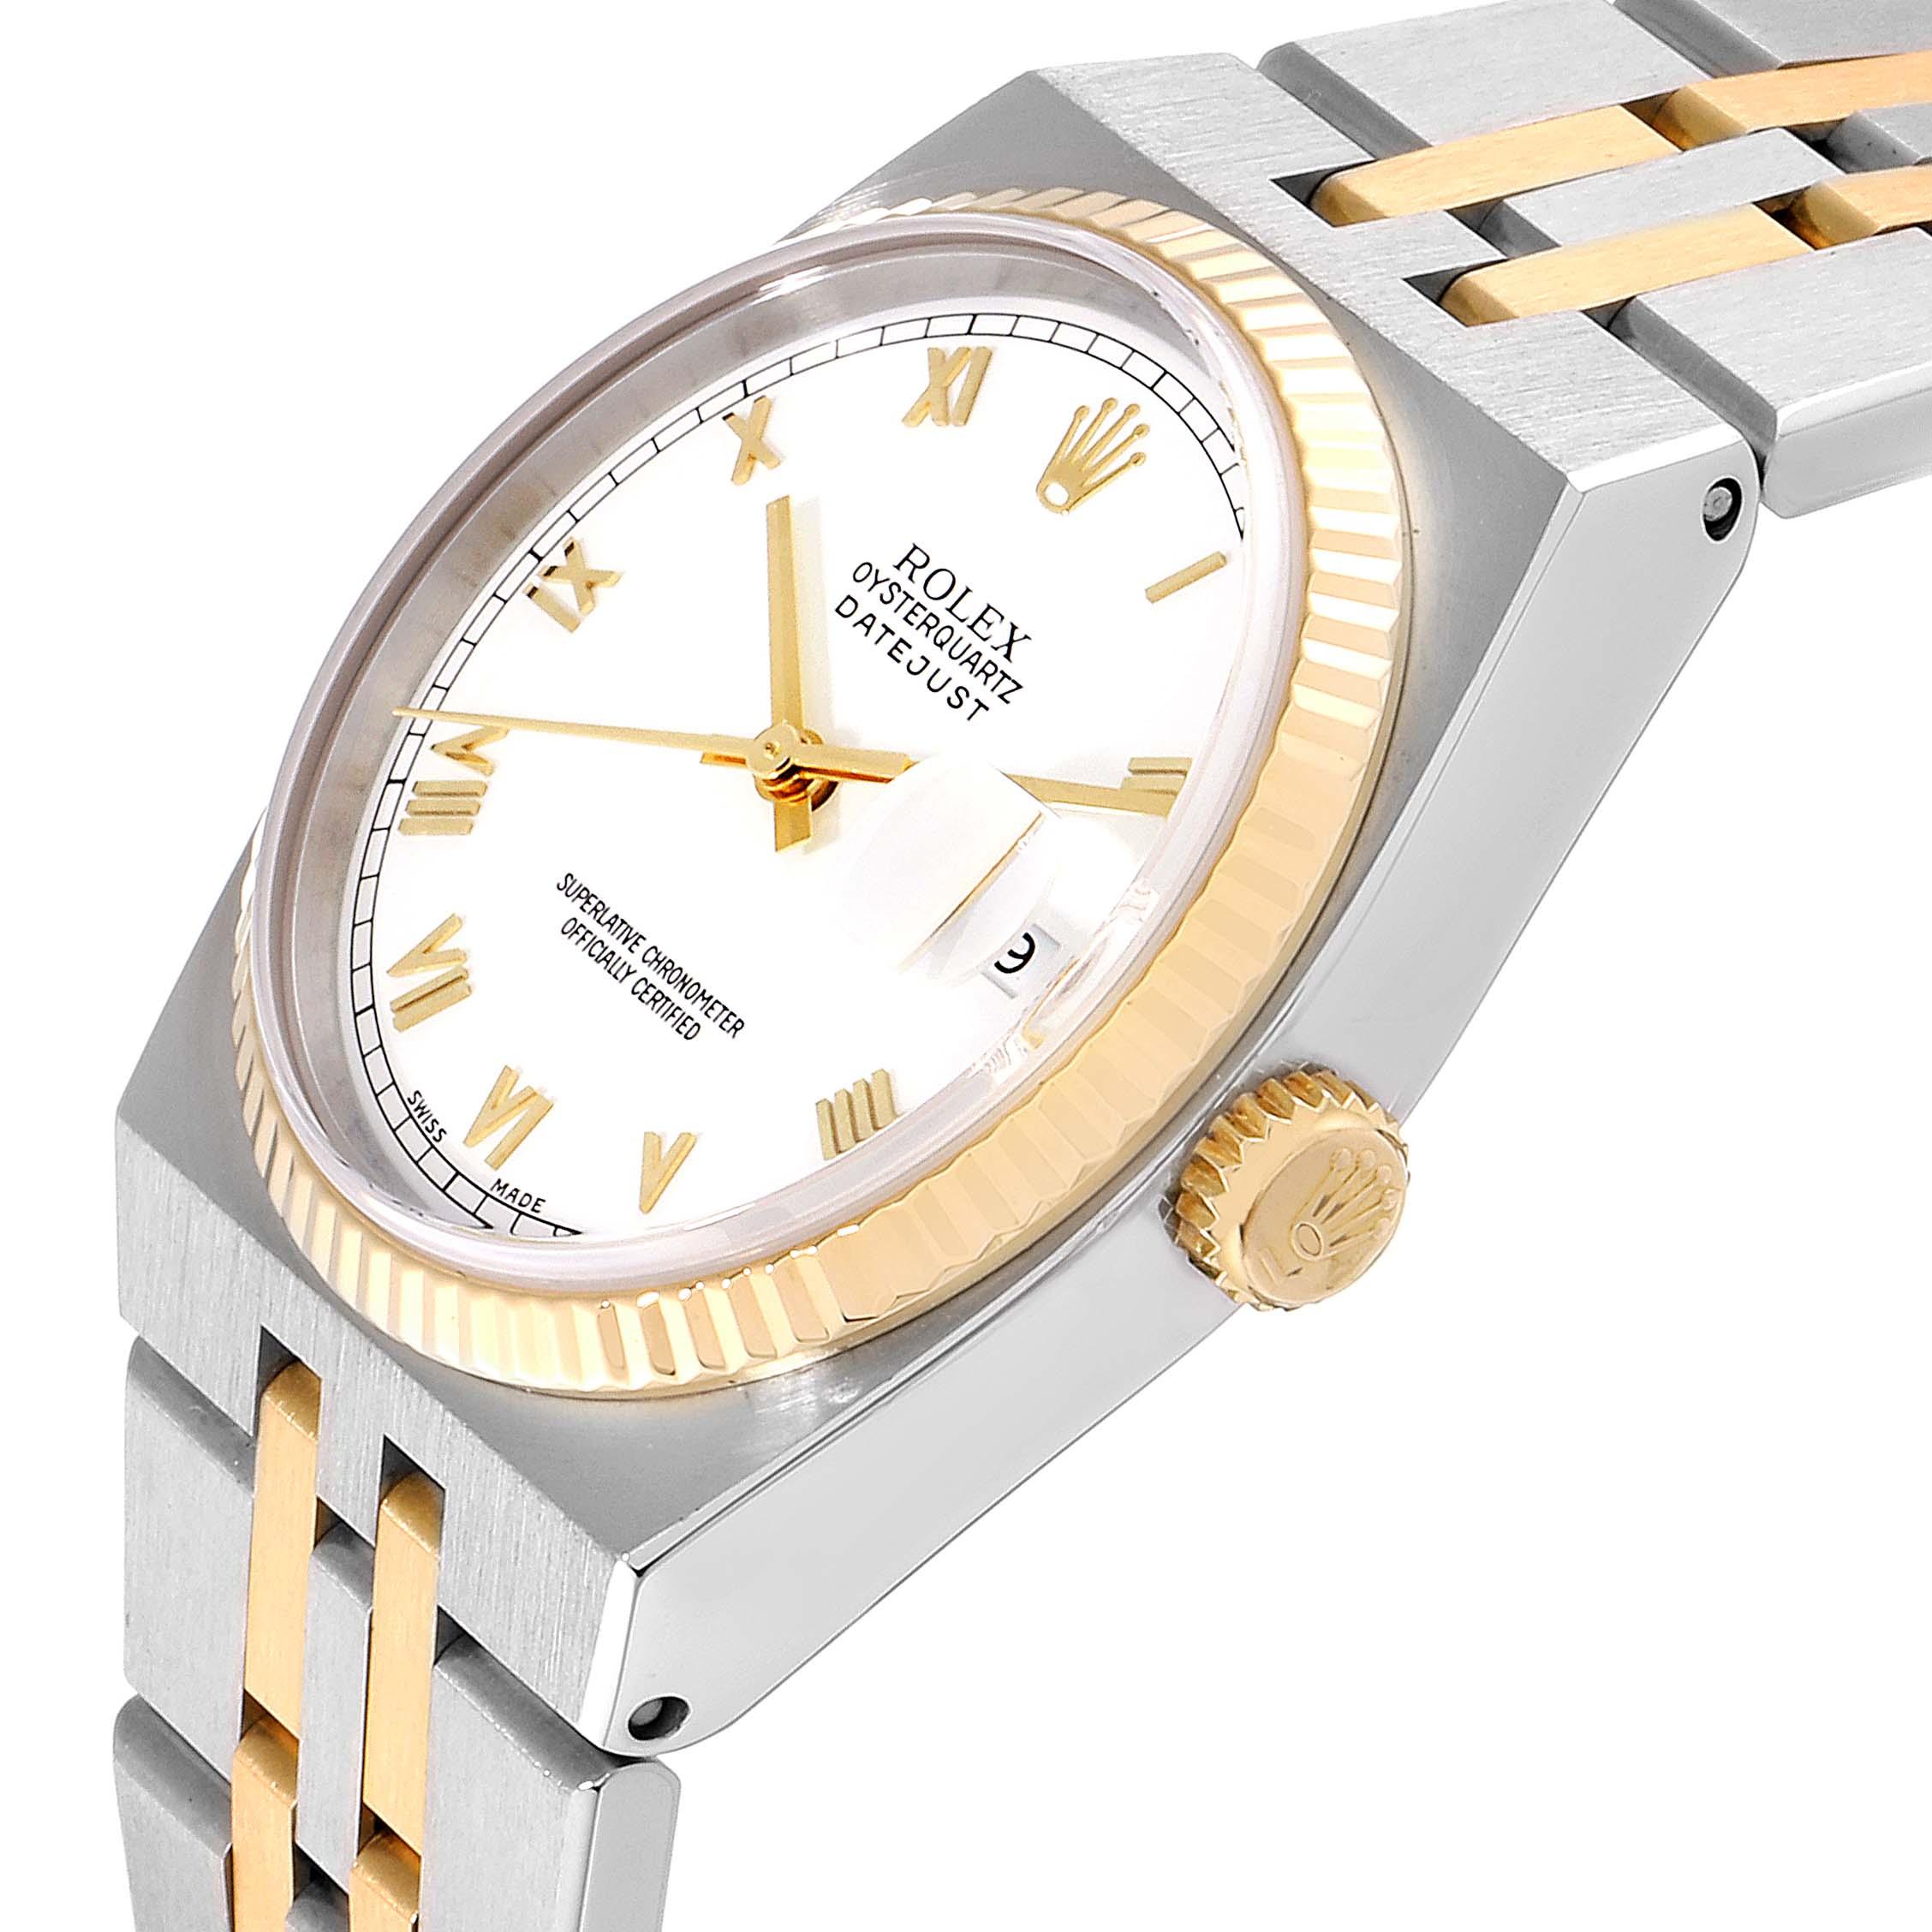 Rolex Oysterquartz Datejust Steel Yellow Gold White Dial Watch 17013 SwissWatchExpo